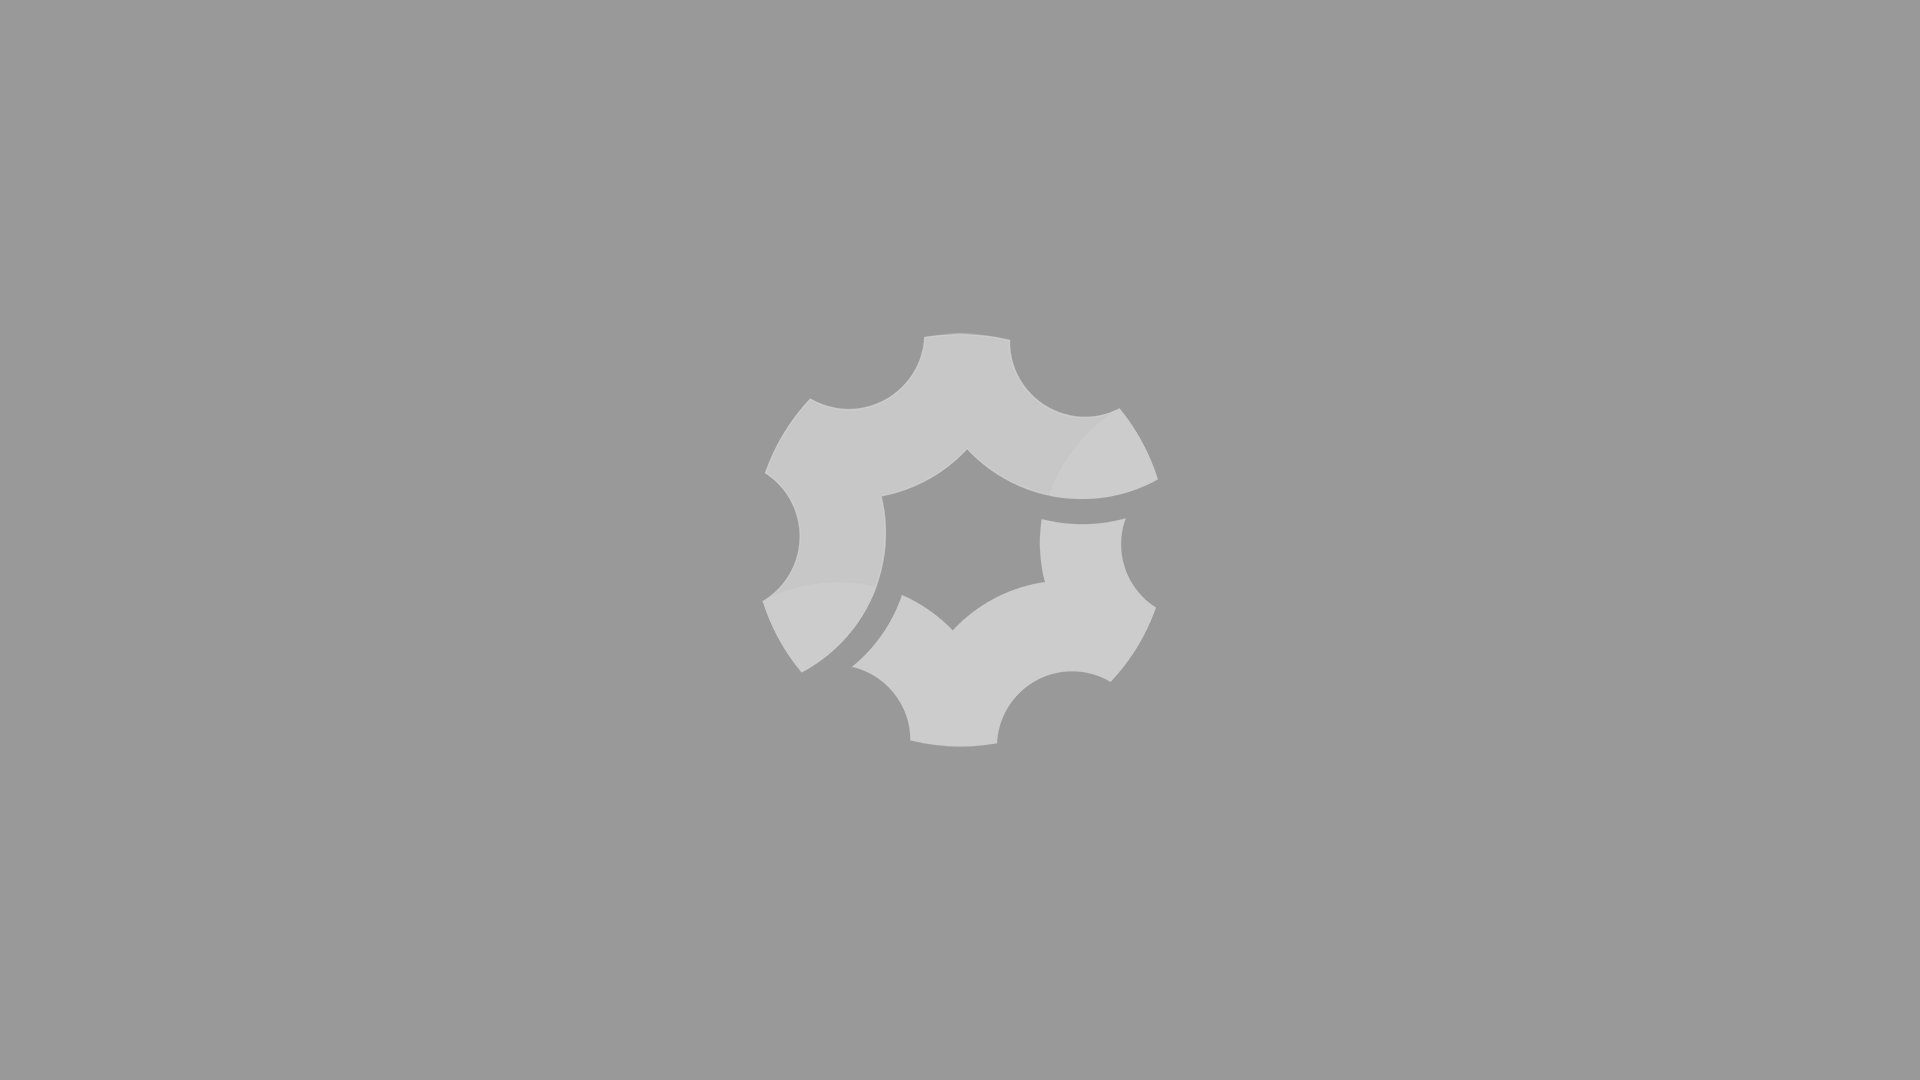 insurgency_sandstorm_screenshot_2020.05.01_-_00.07.59.31.png